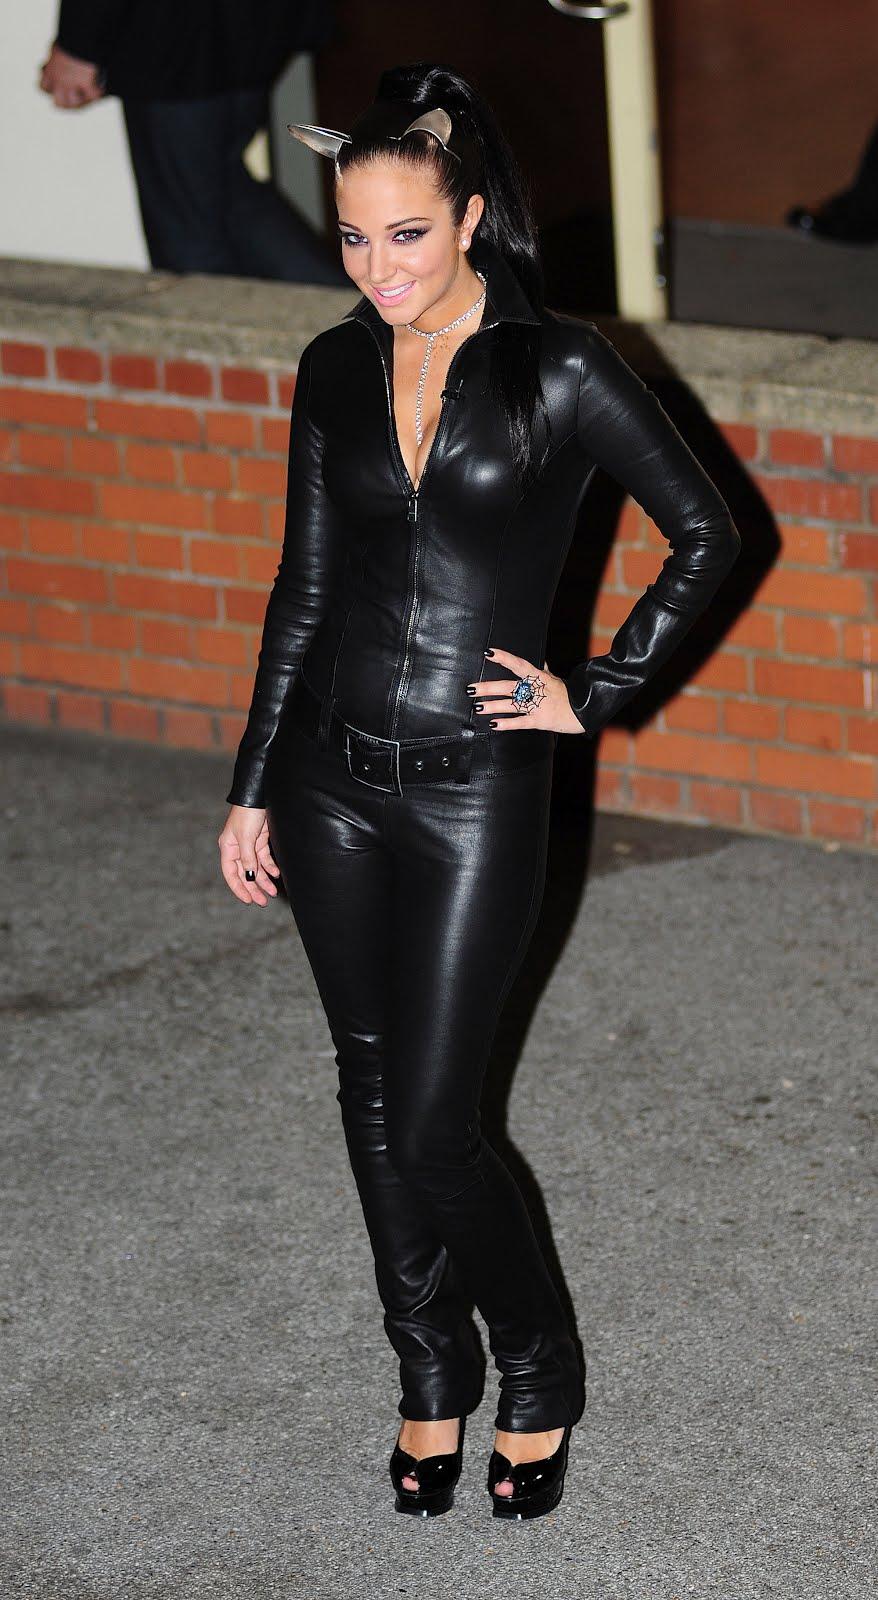 Leather Leather Leather Blog: Tulisa Contostavlos Leather ...